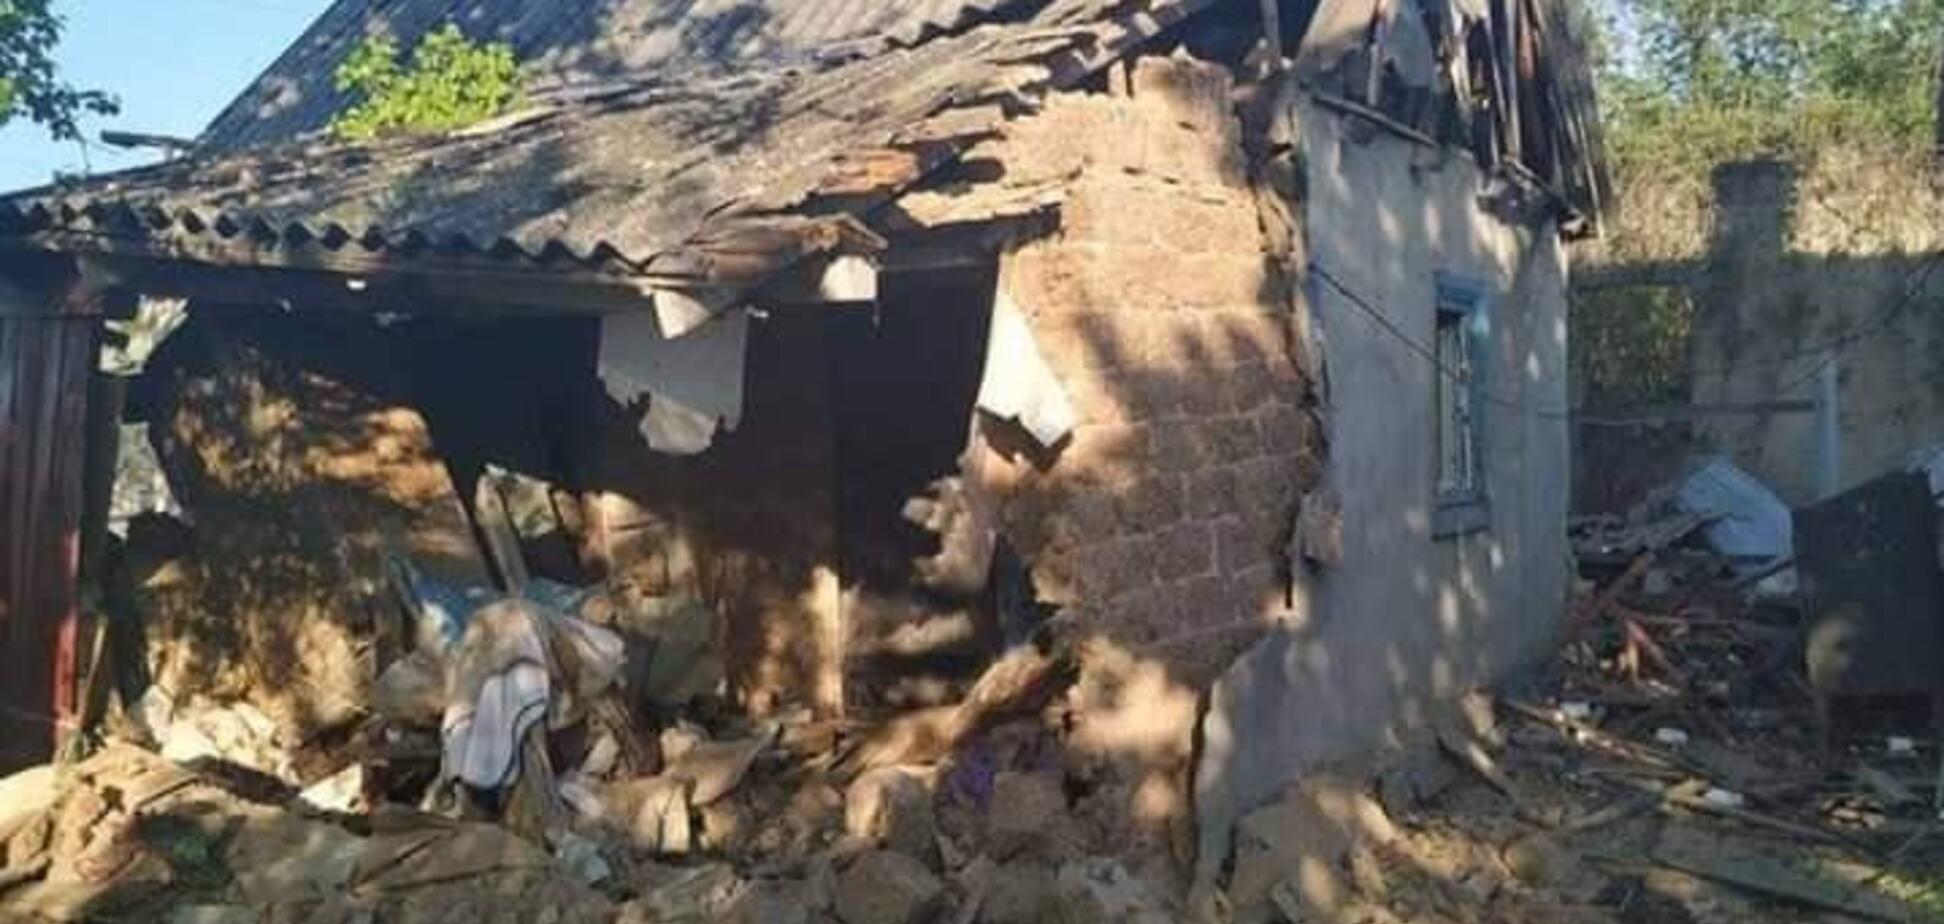 Обстрел террористами домов на Донбассе